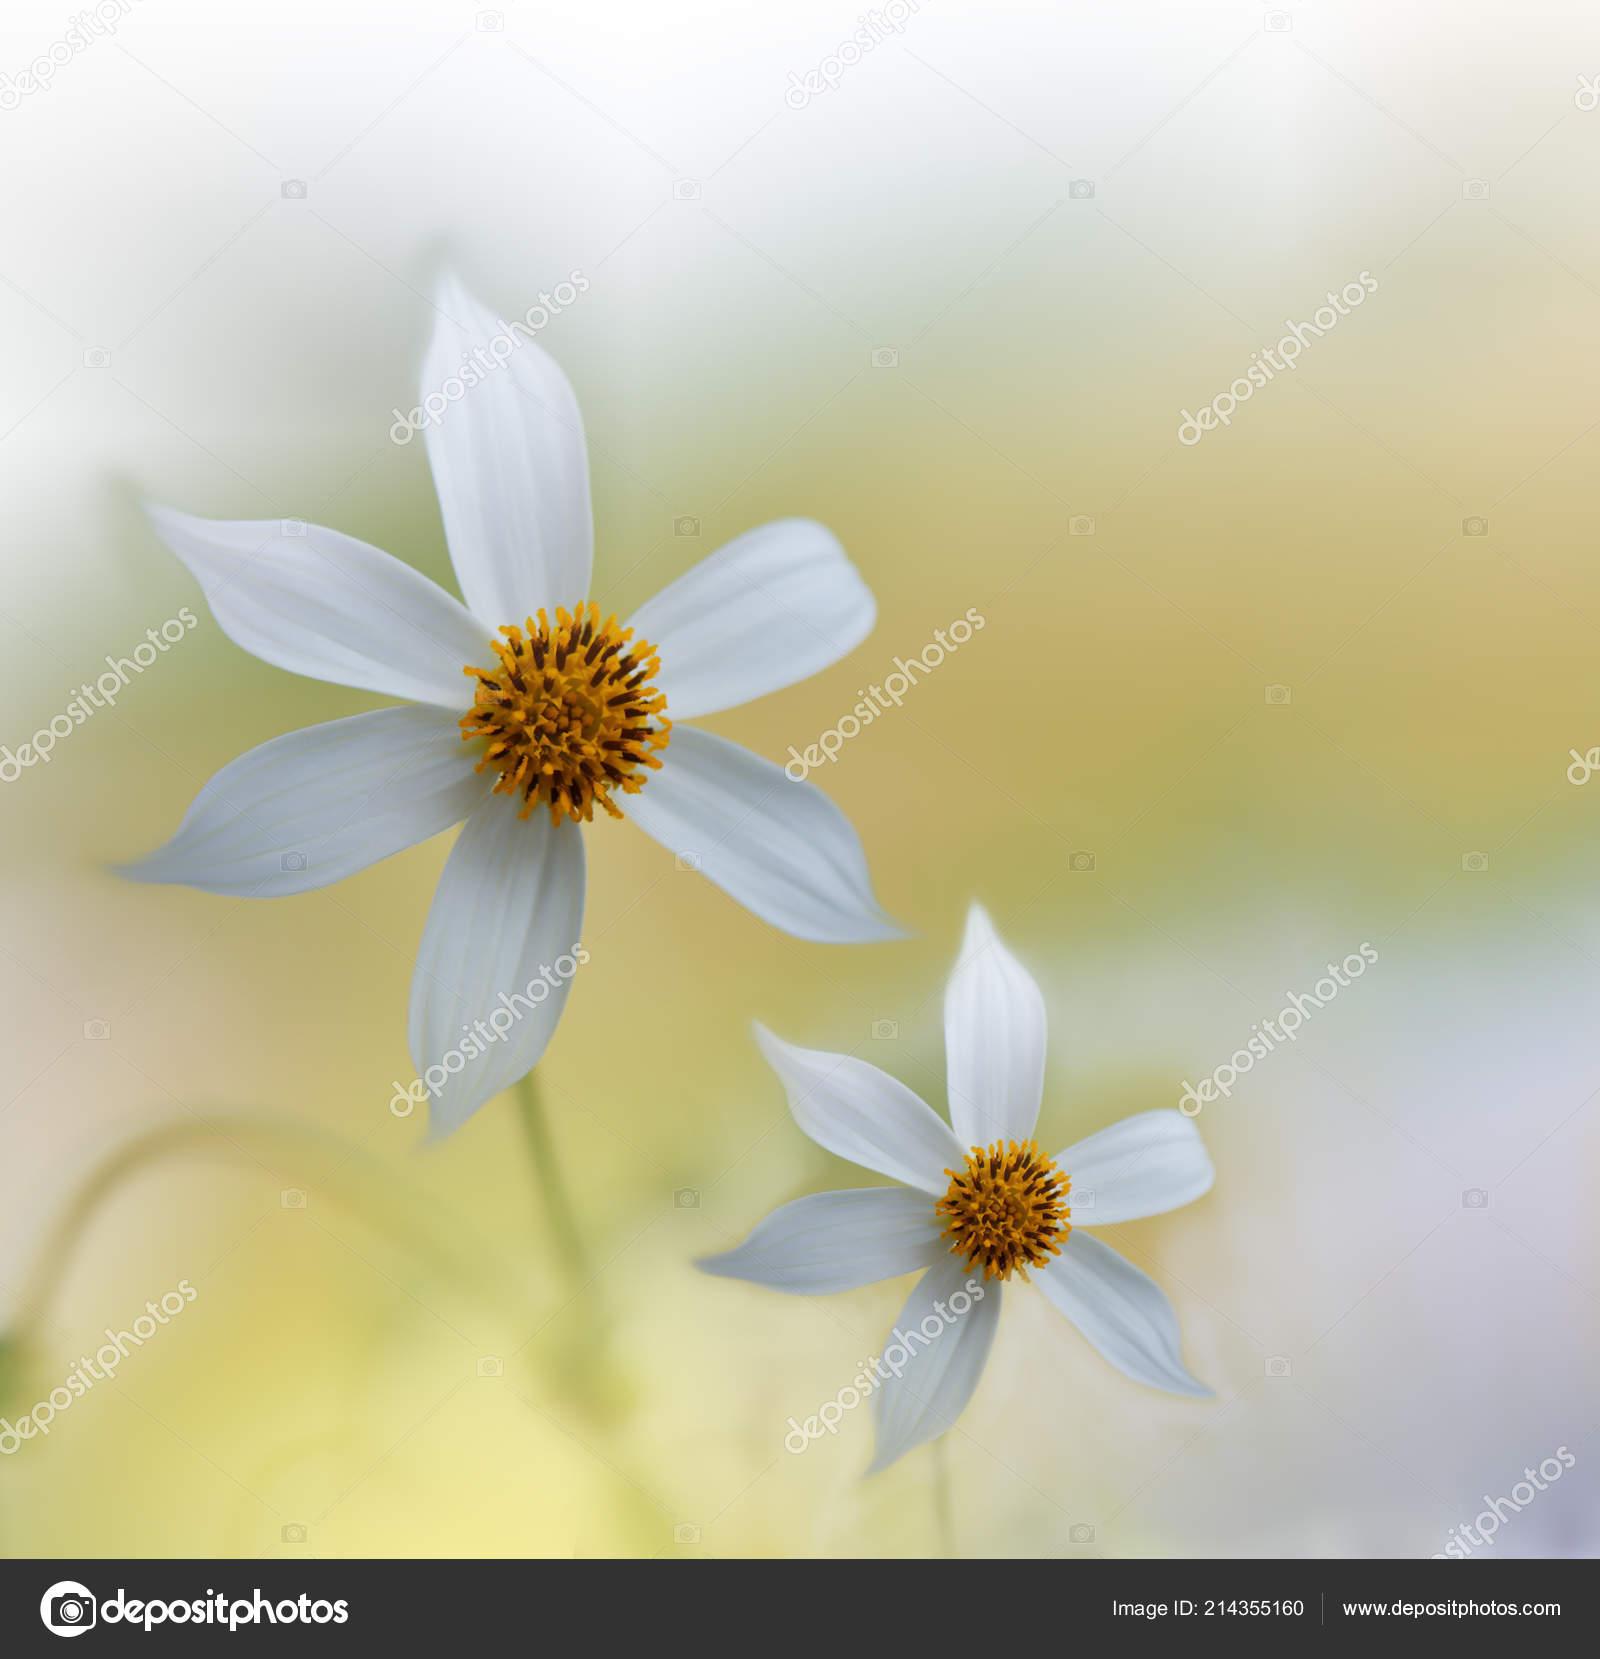 Romantic Flower Invitation Greeting Card Floral Fantasy Design White Background Stock Photo C Art Juli Abv Bg 214355160